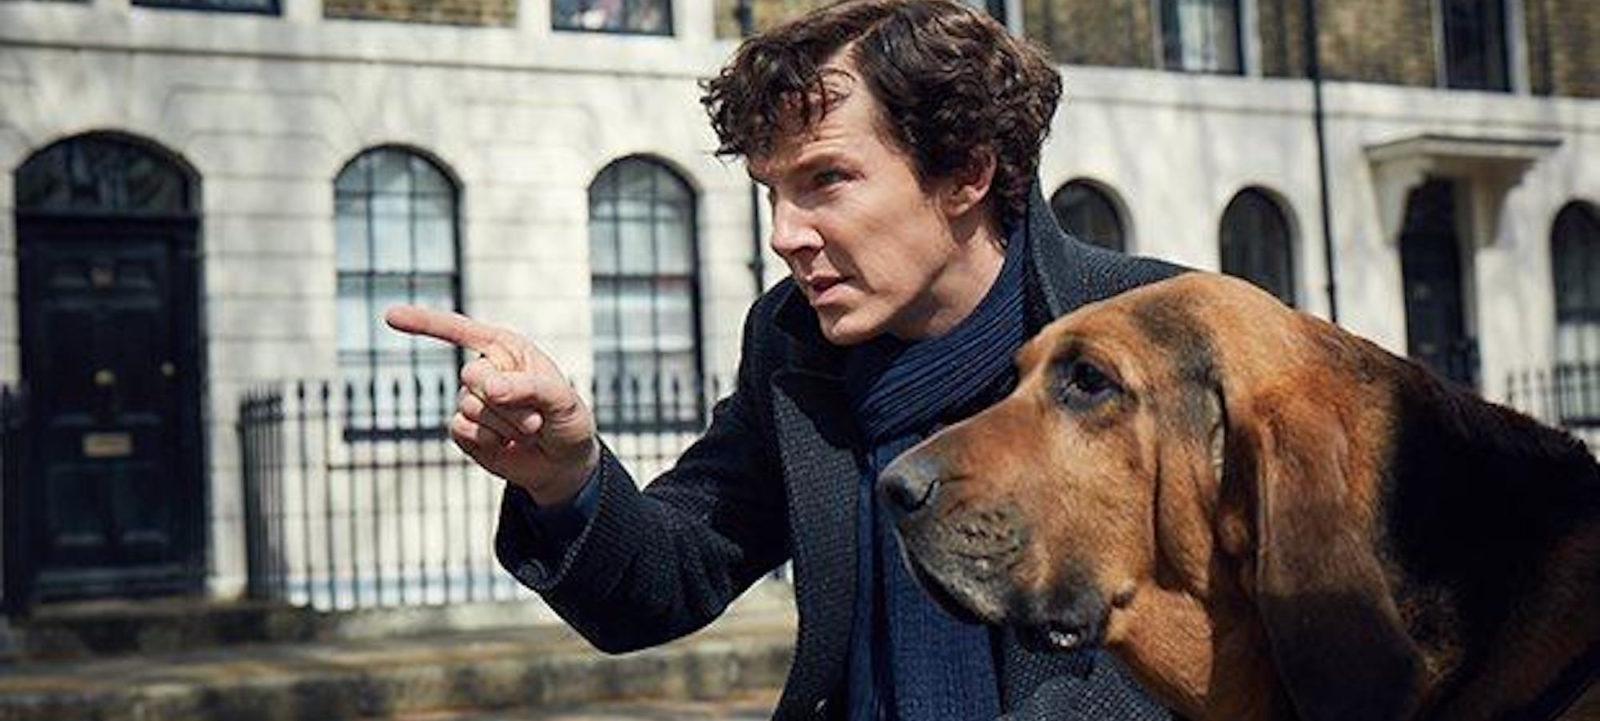 Benedict Cumberbatch in season 4 of 'Sherlock'